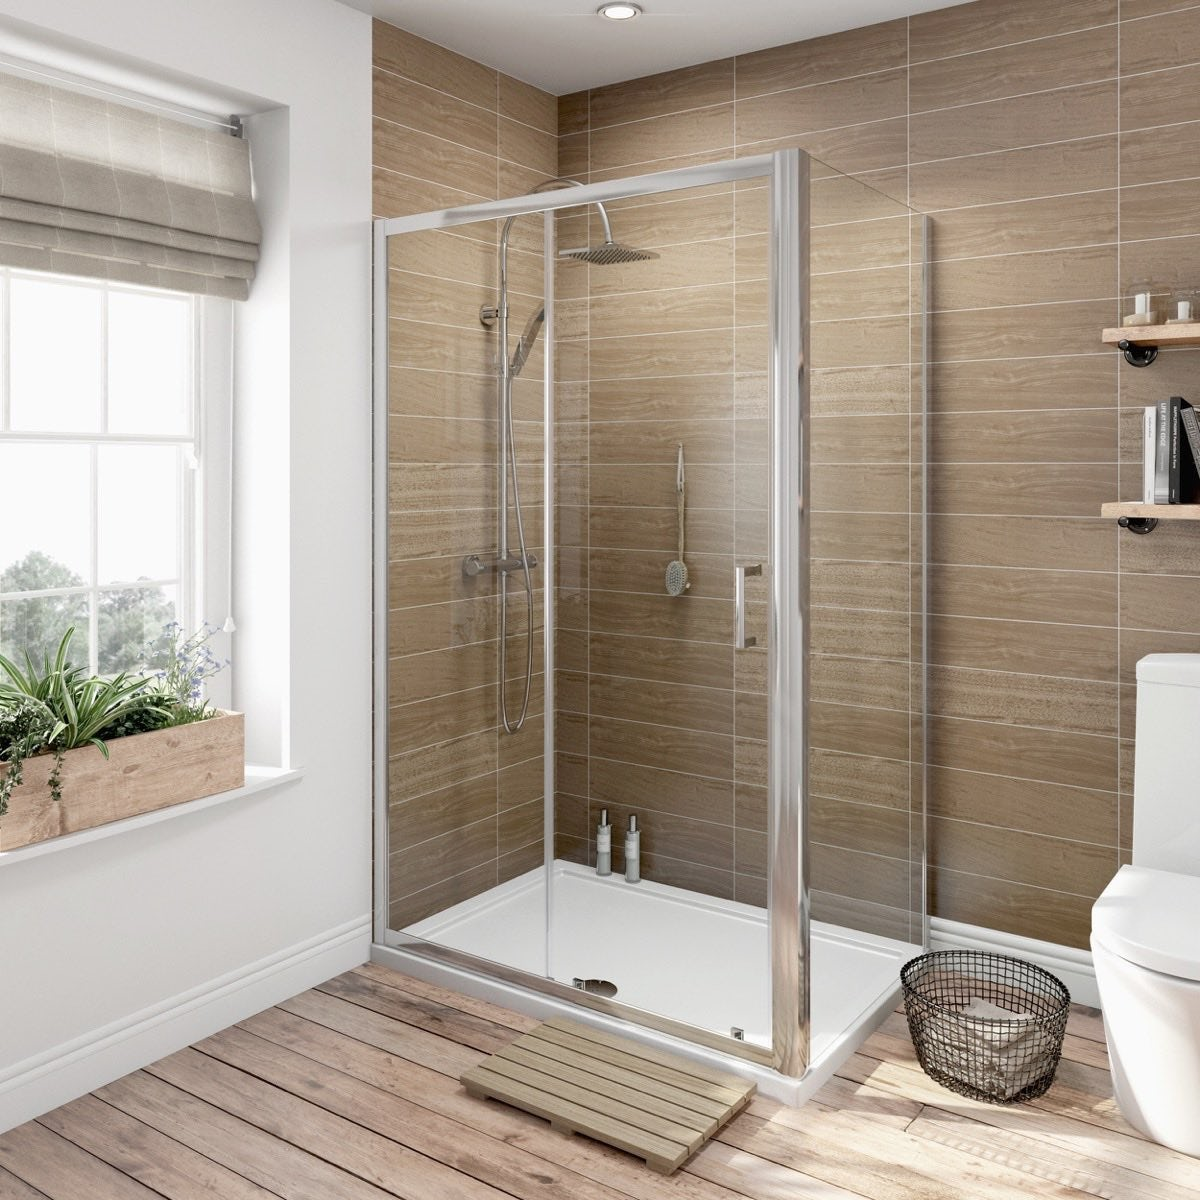 & Orchard 6mm sliding door rectangular shower enclosure | VictoriaPlum.com